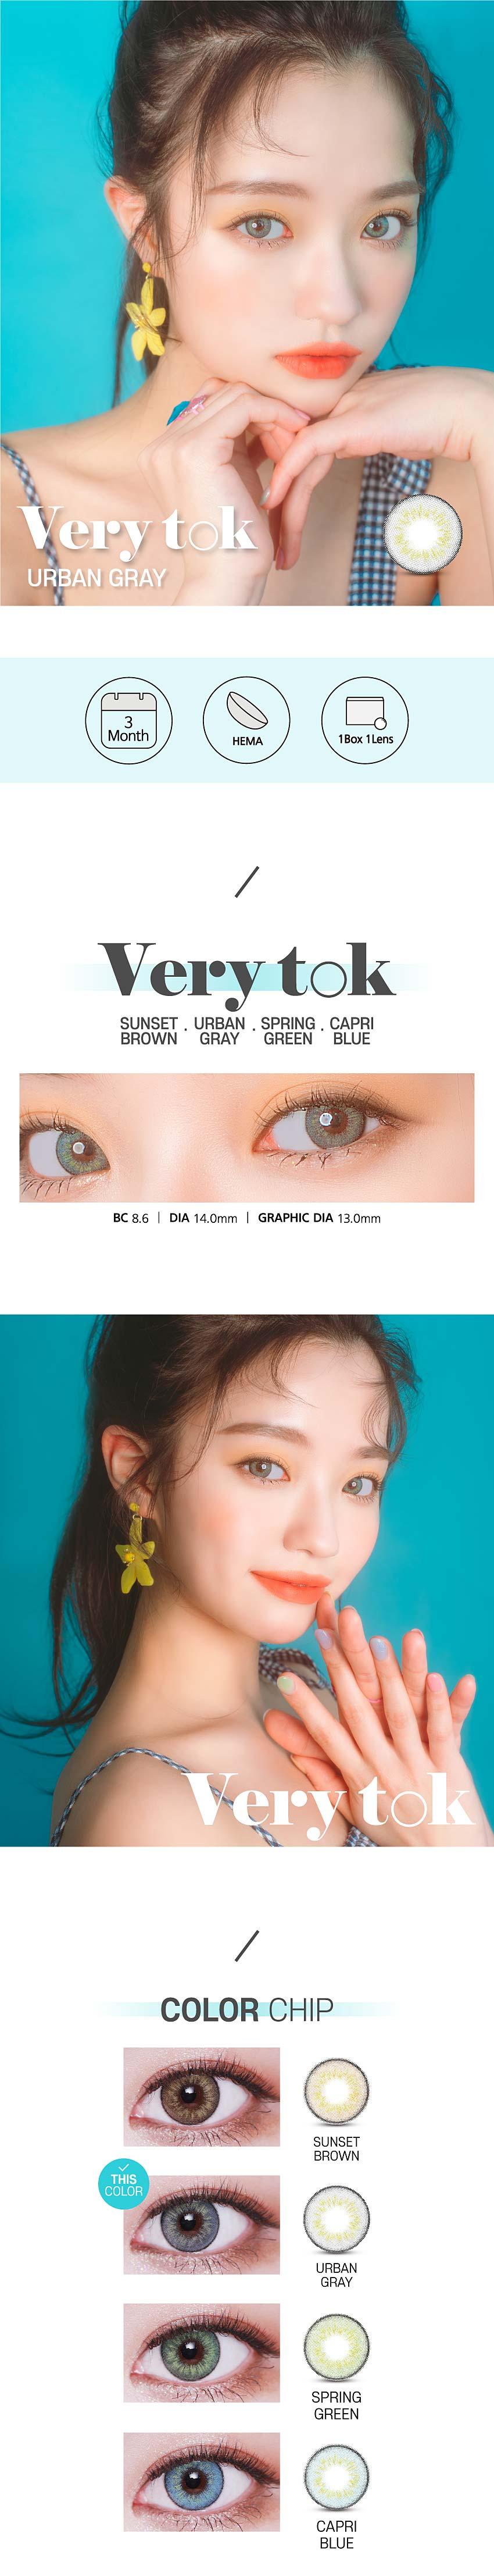 verytok-uban-gray-korean-contacts3.jpg